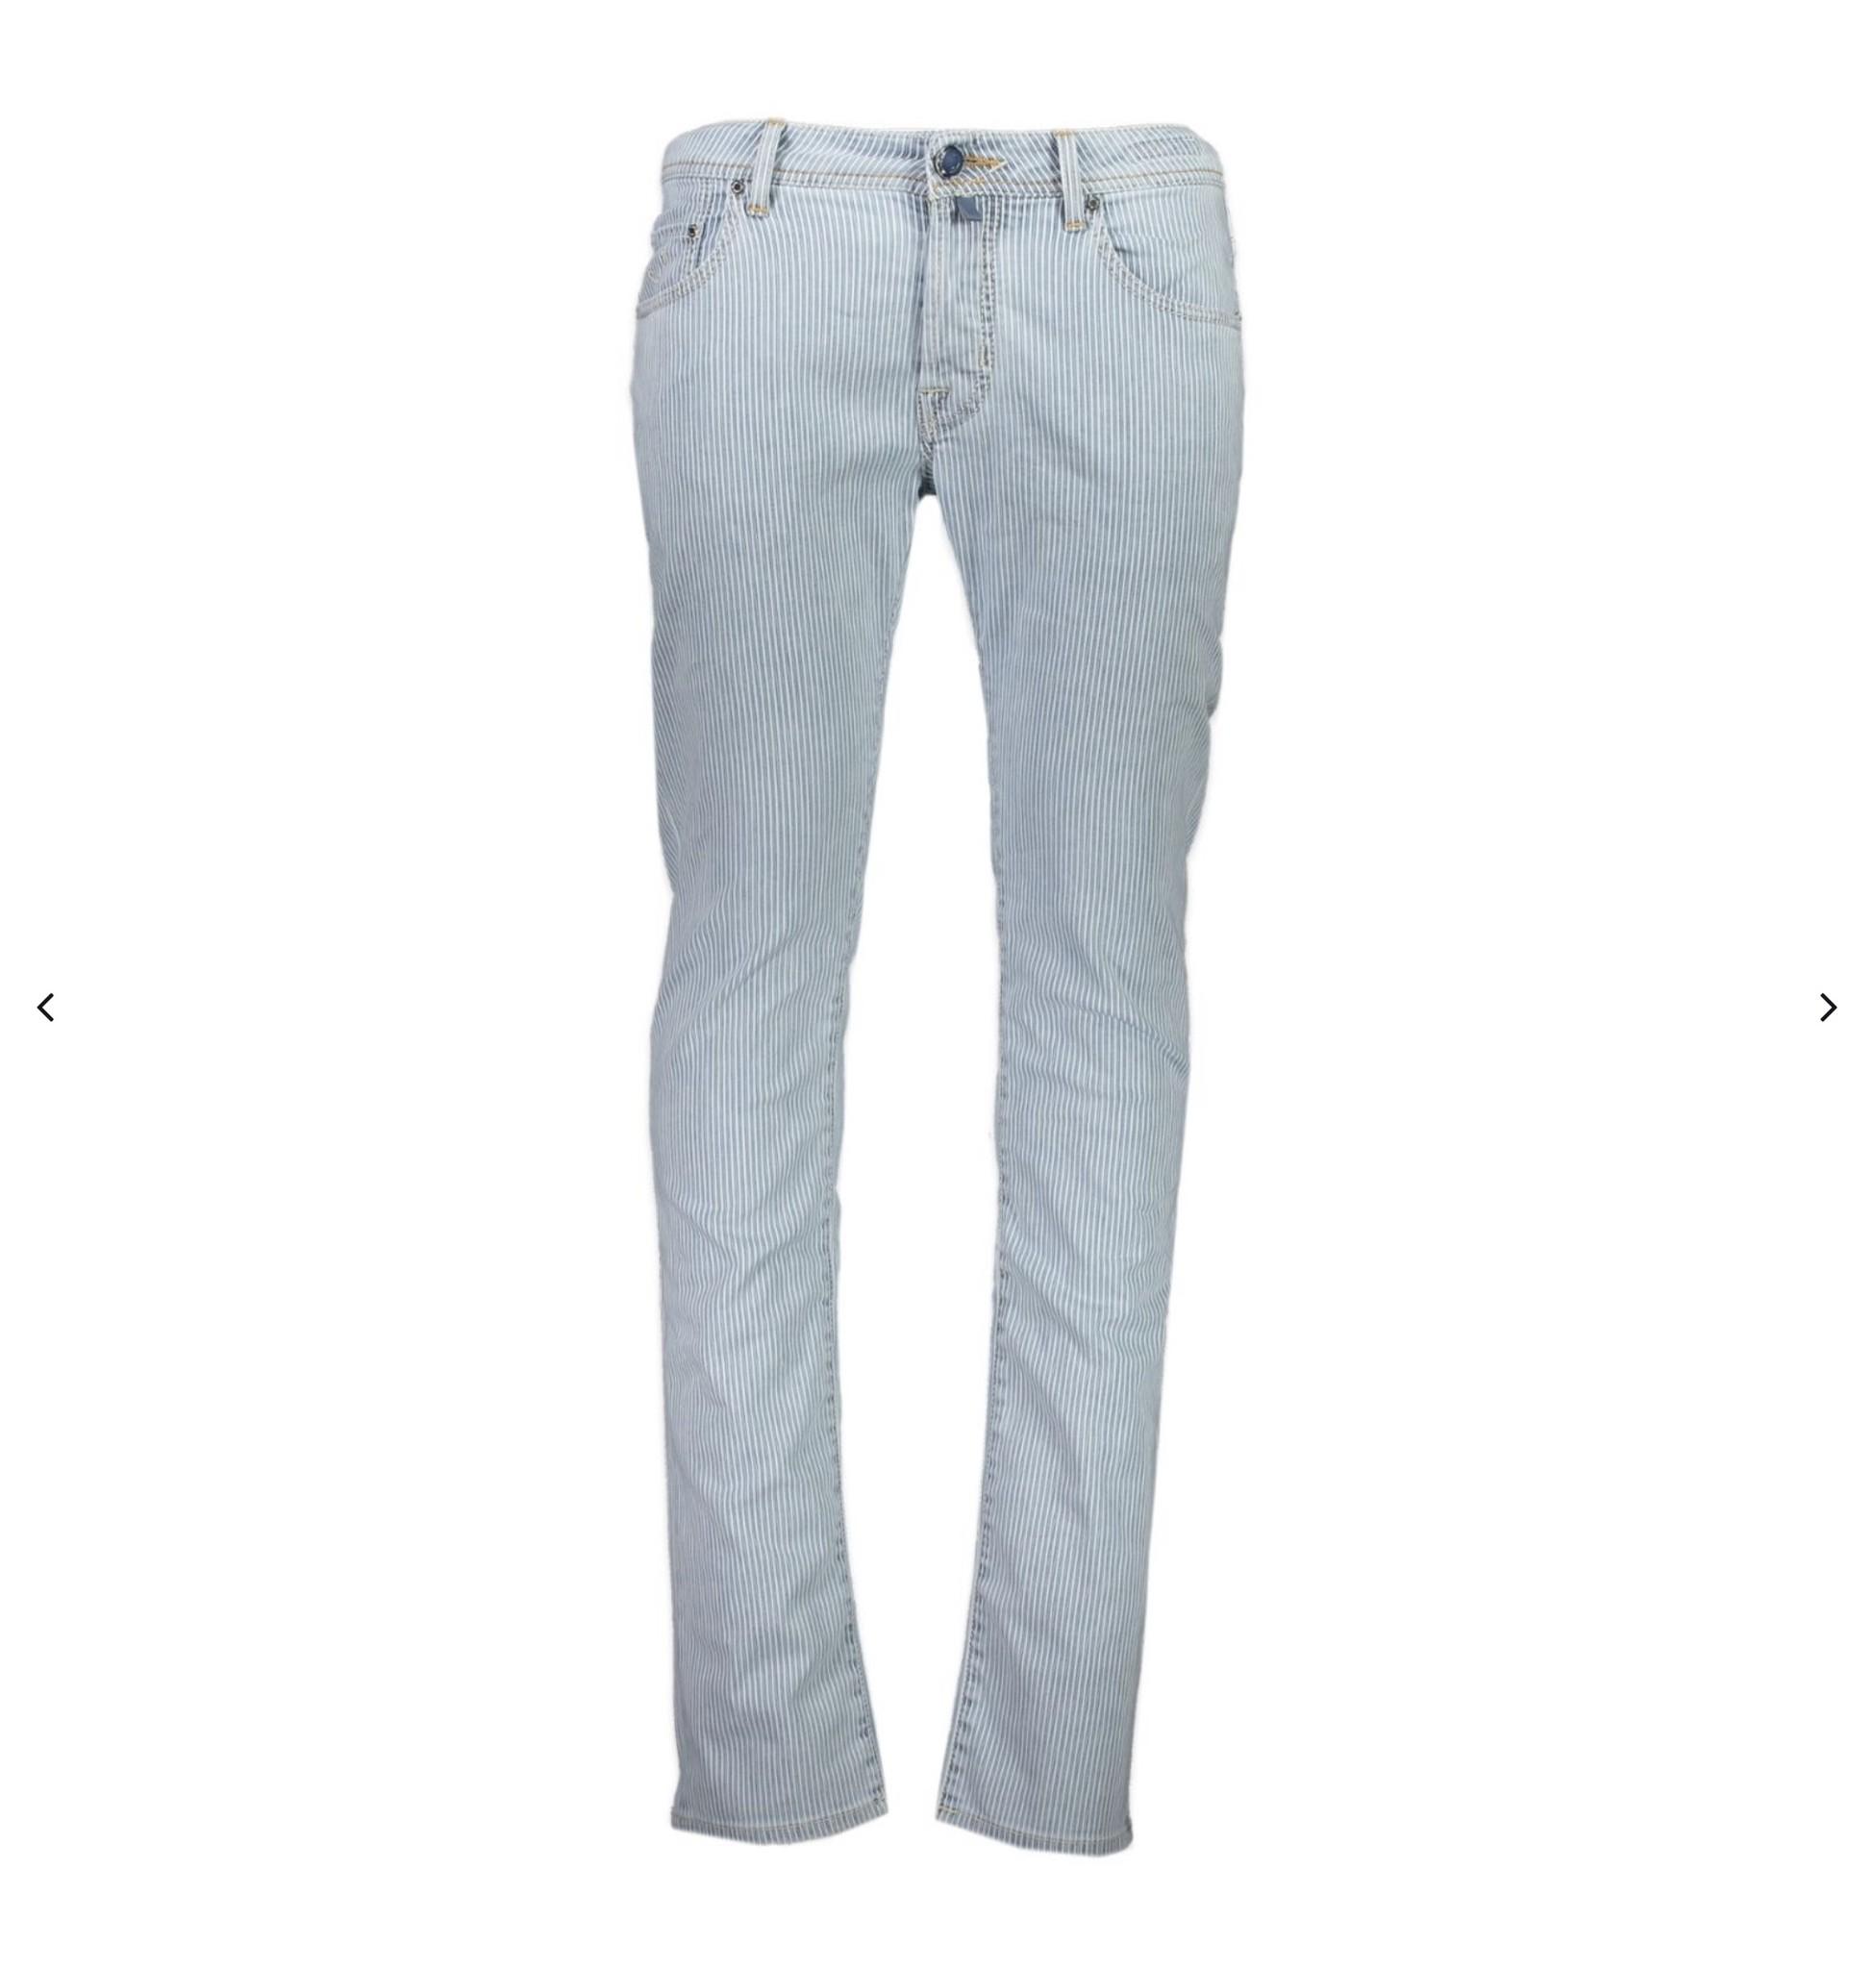 J622 Comf Jeans-1